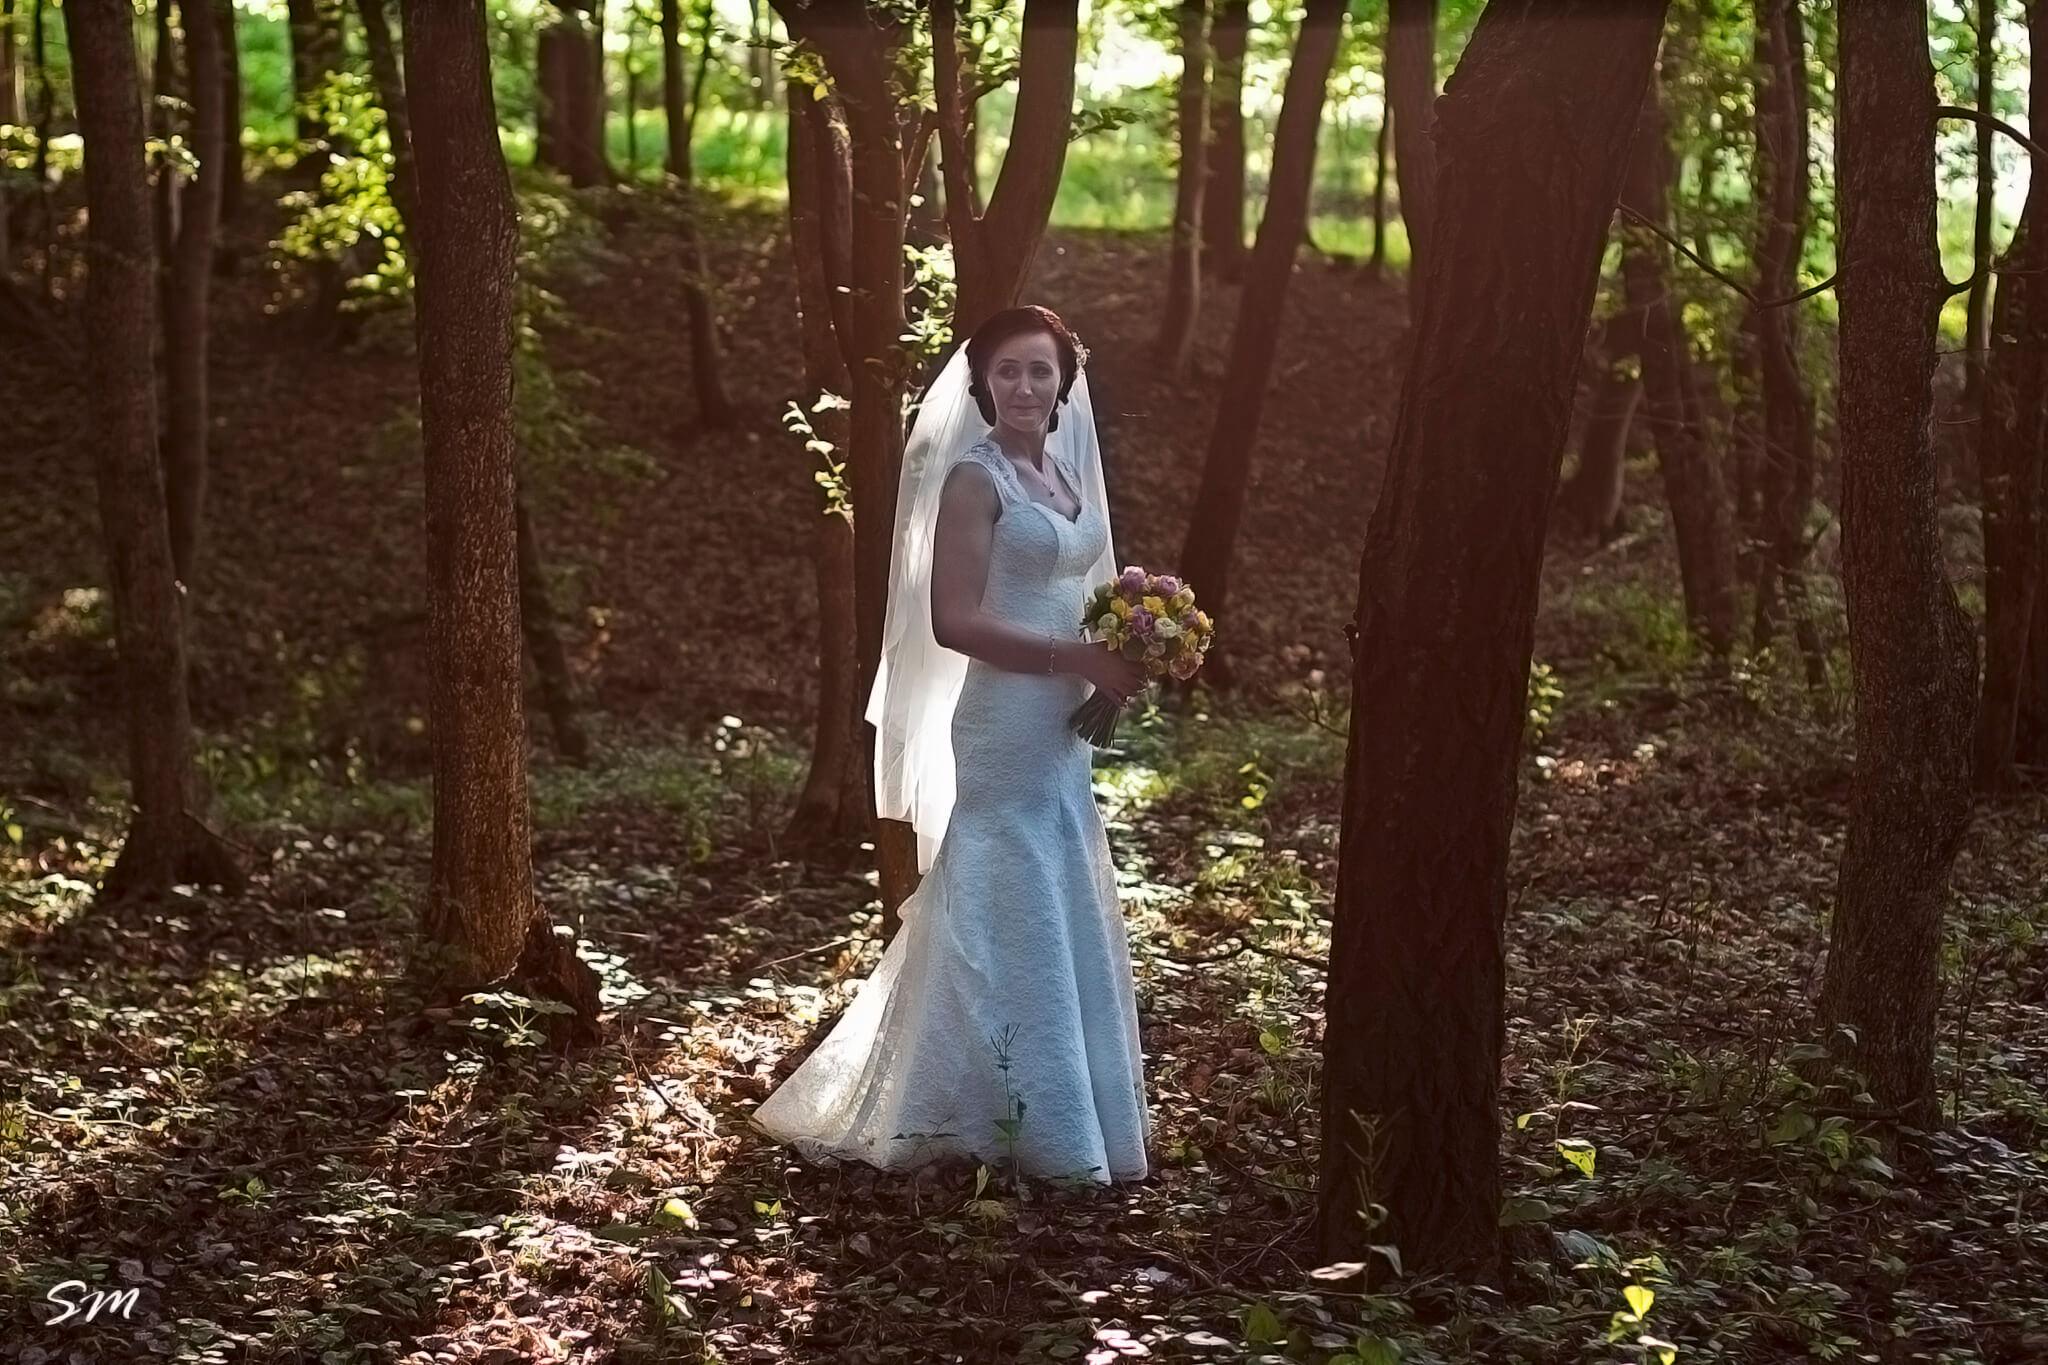 fotograf_profesionist_nunta_suceava (25)